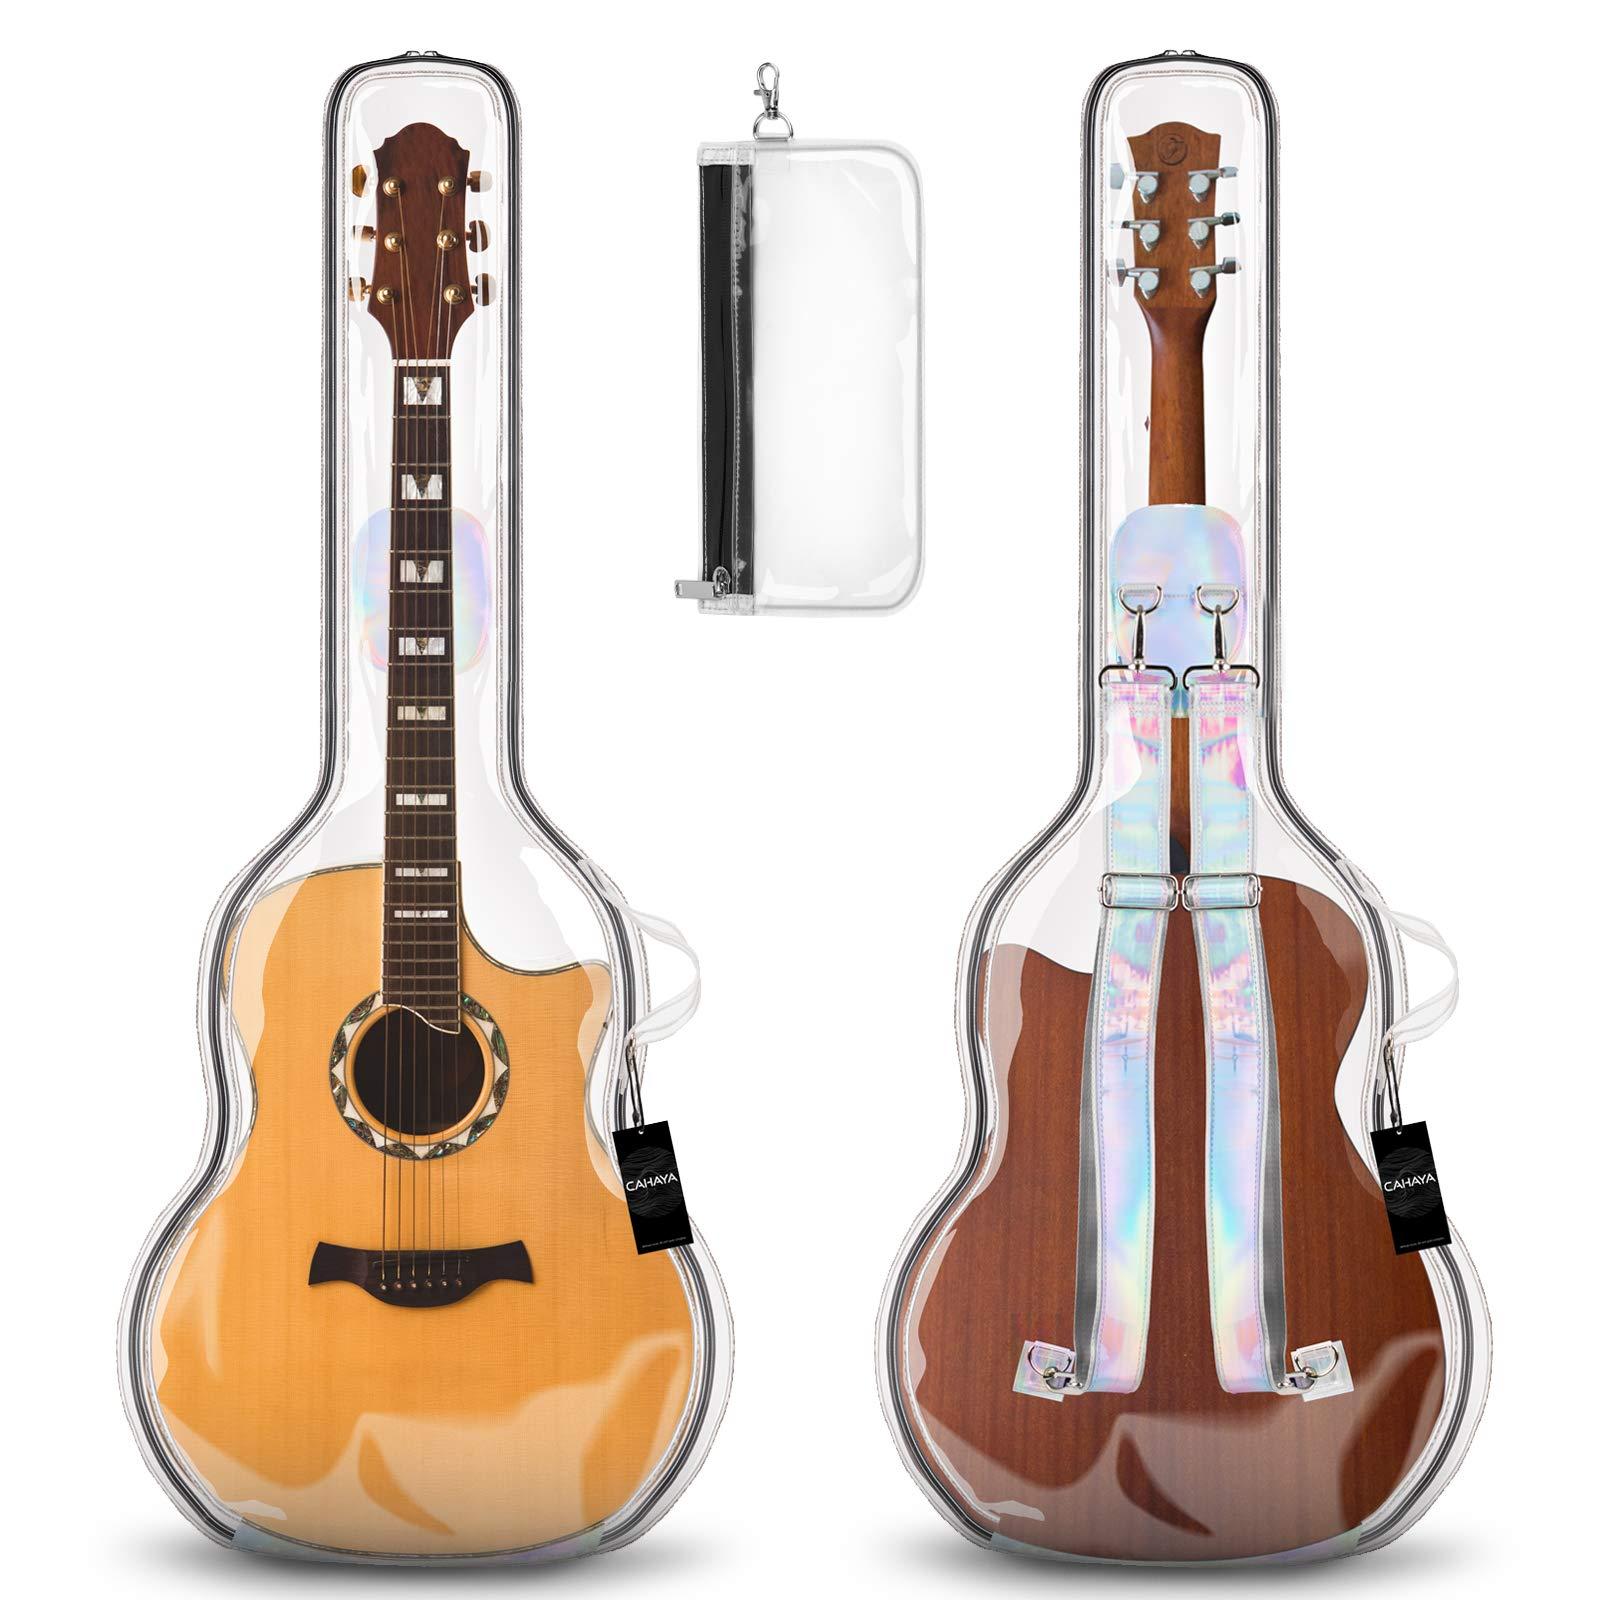 CAHAYA Guitar Bag Acoustic Backpack Soft Gig Bag Transparent 41inch Guitar Carrying Bag with Handbag for Accessories